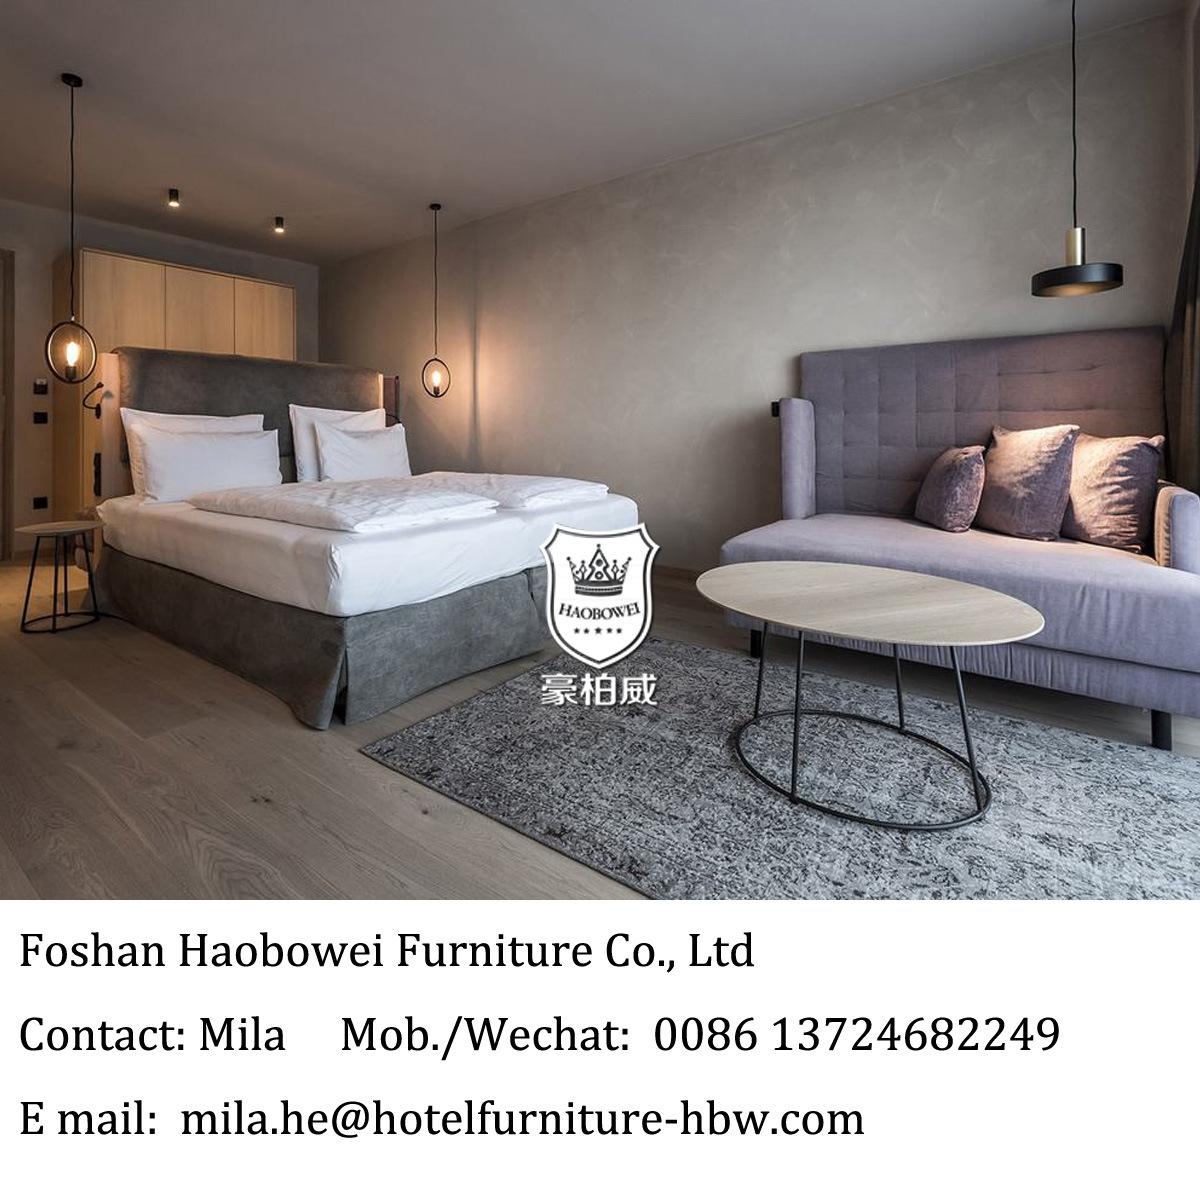 China 2018 modern nordic hotel design bedroom furniture suite byd hr sw1802 china hotel suite room furniture nordic hotel furniture